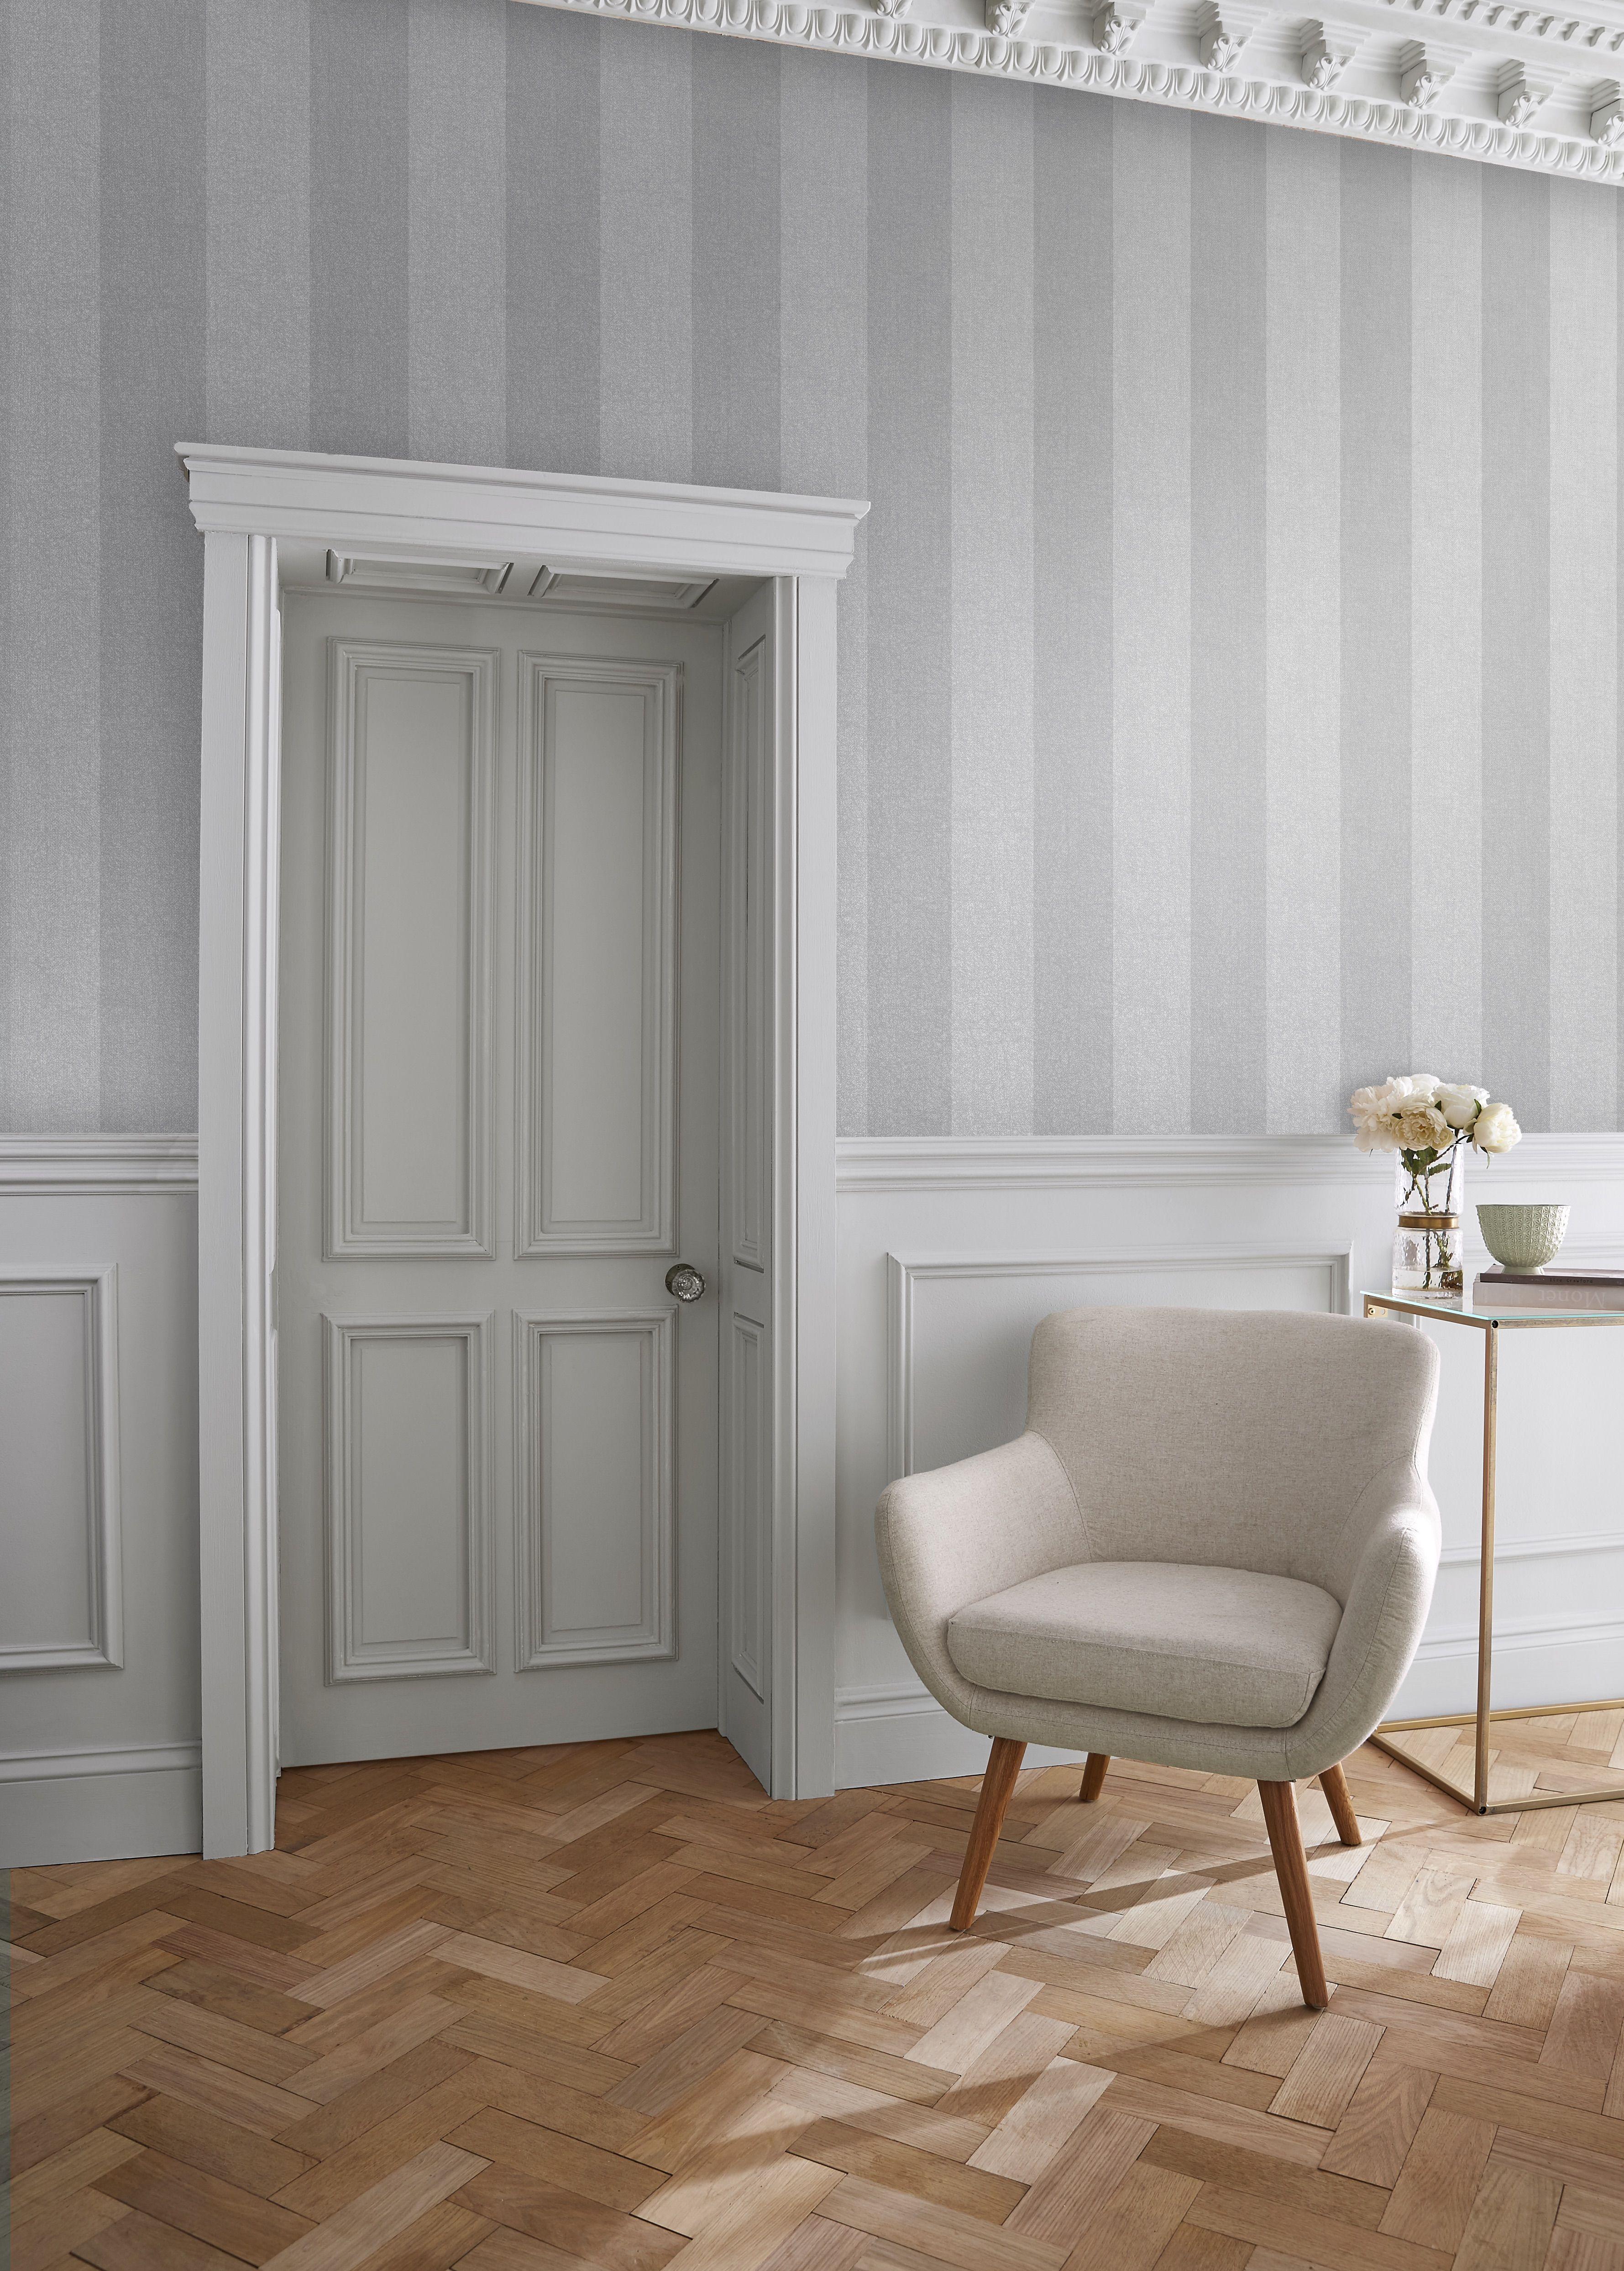 Living Room Wallpaper Ideas, Wallpaper For Living Rooms